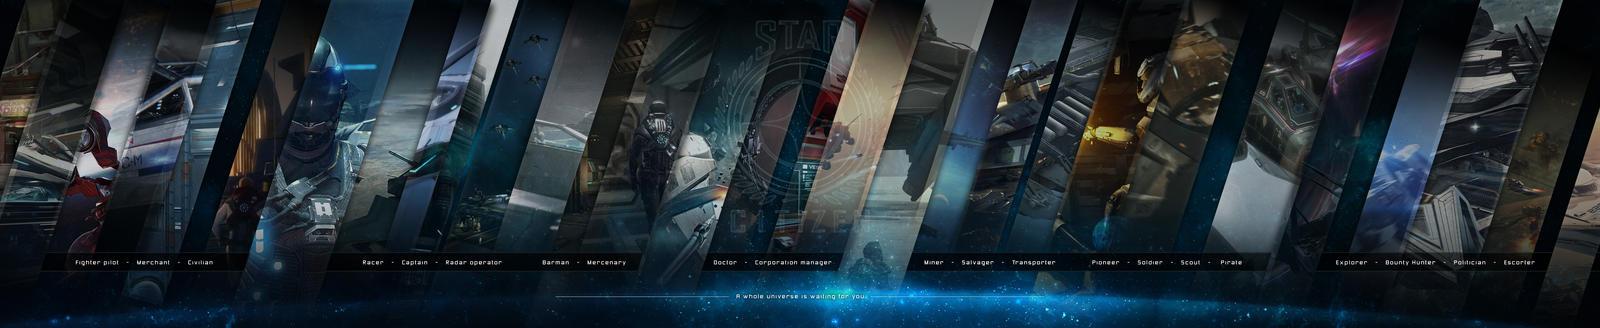 Star Citizen Triple Screen Wallpaper By Logan0015 On